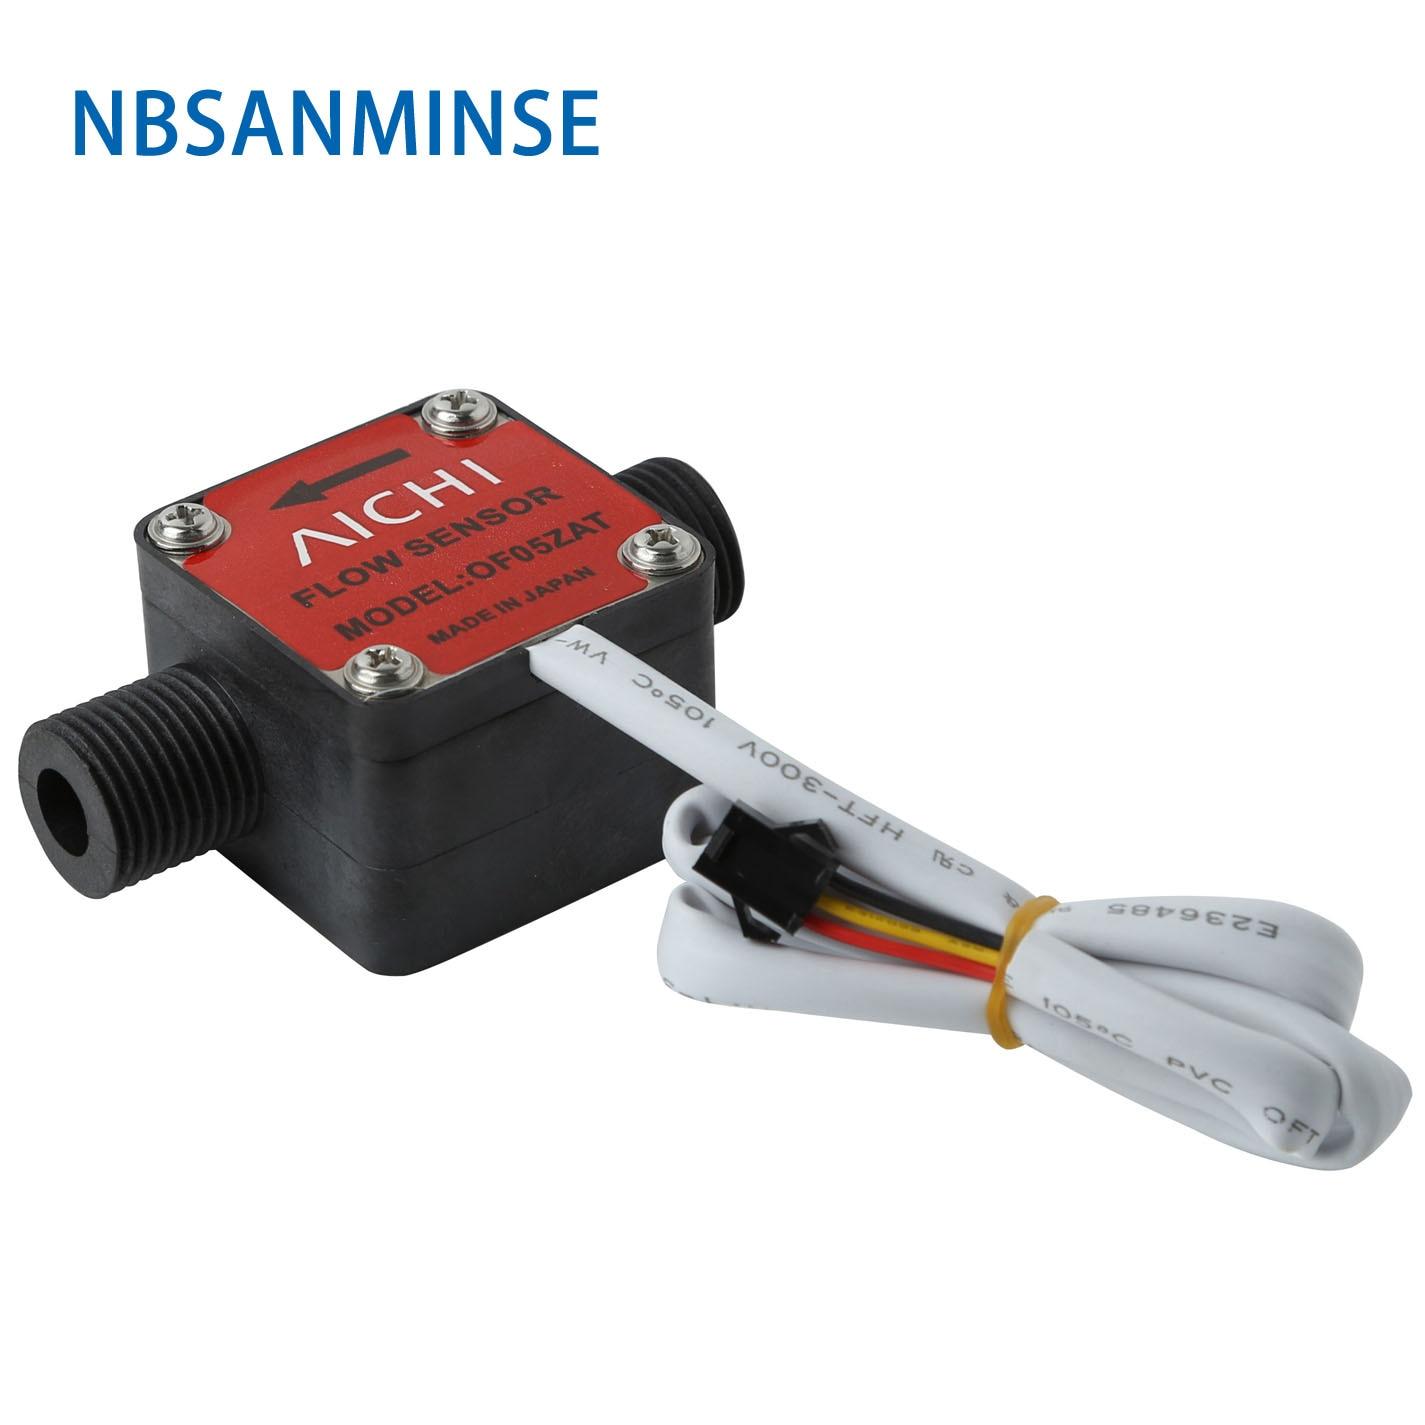 NBSANMINSE SMOF05ZAT Gear Flow Meter Oil Milk Honey Dishwashing Sensor Hall Flowmeter Square Cover